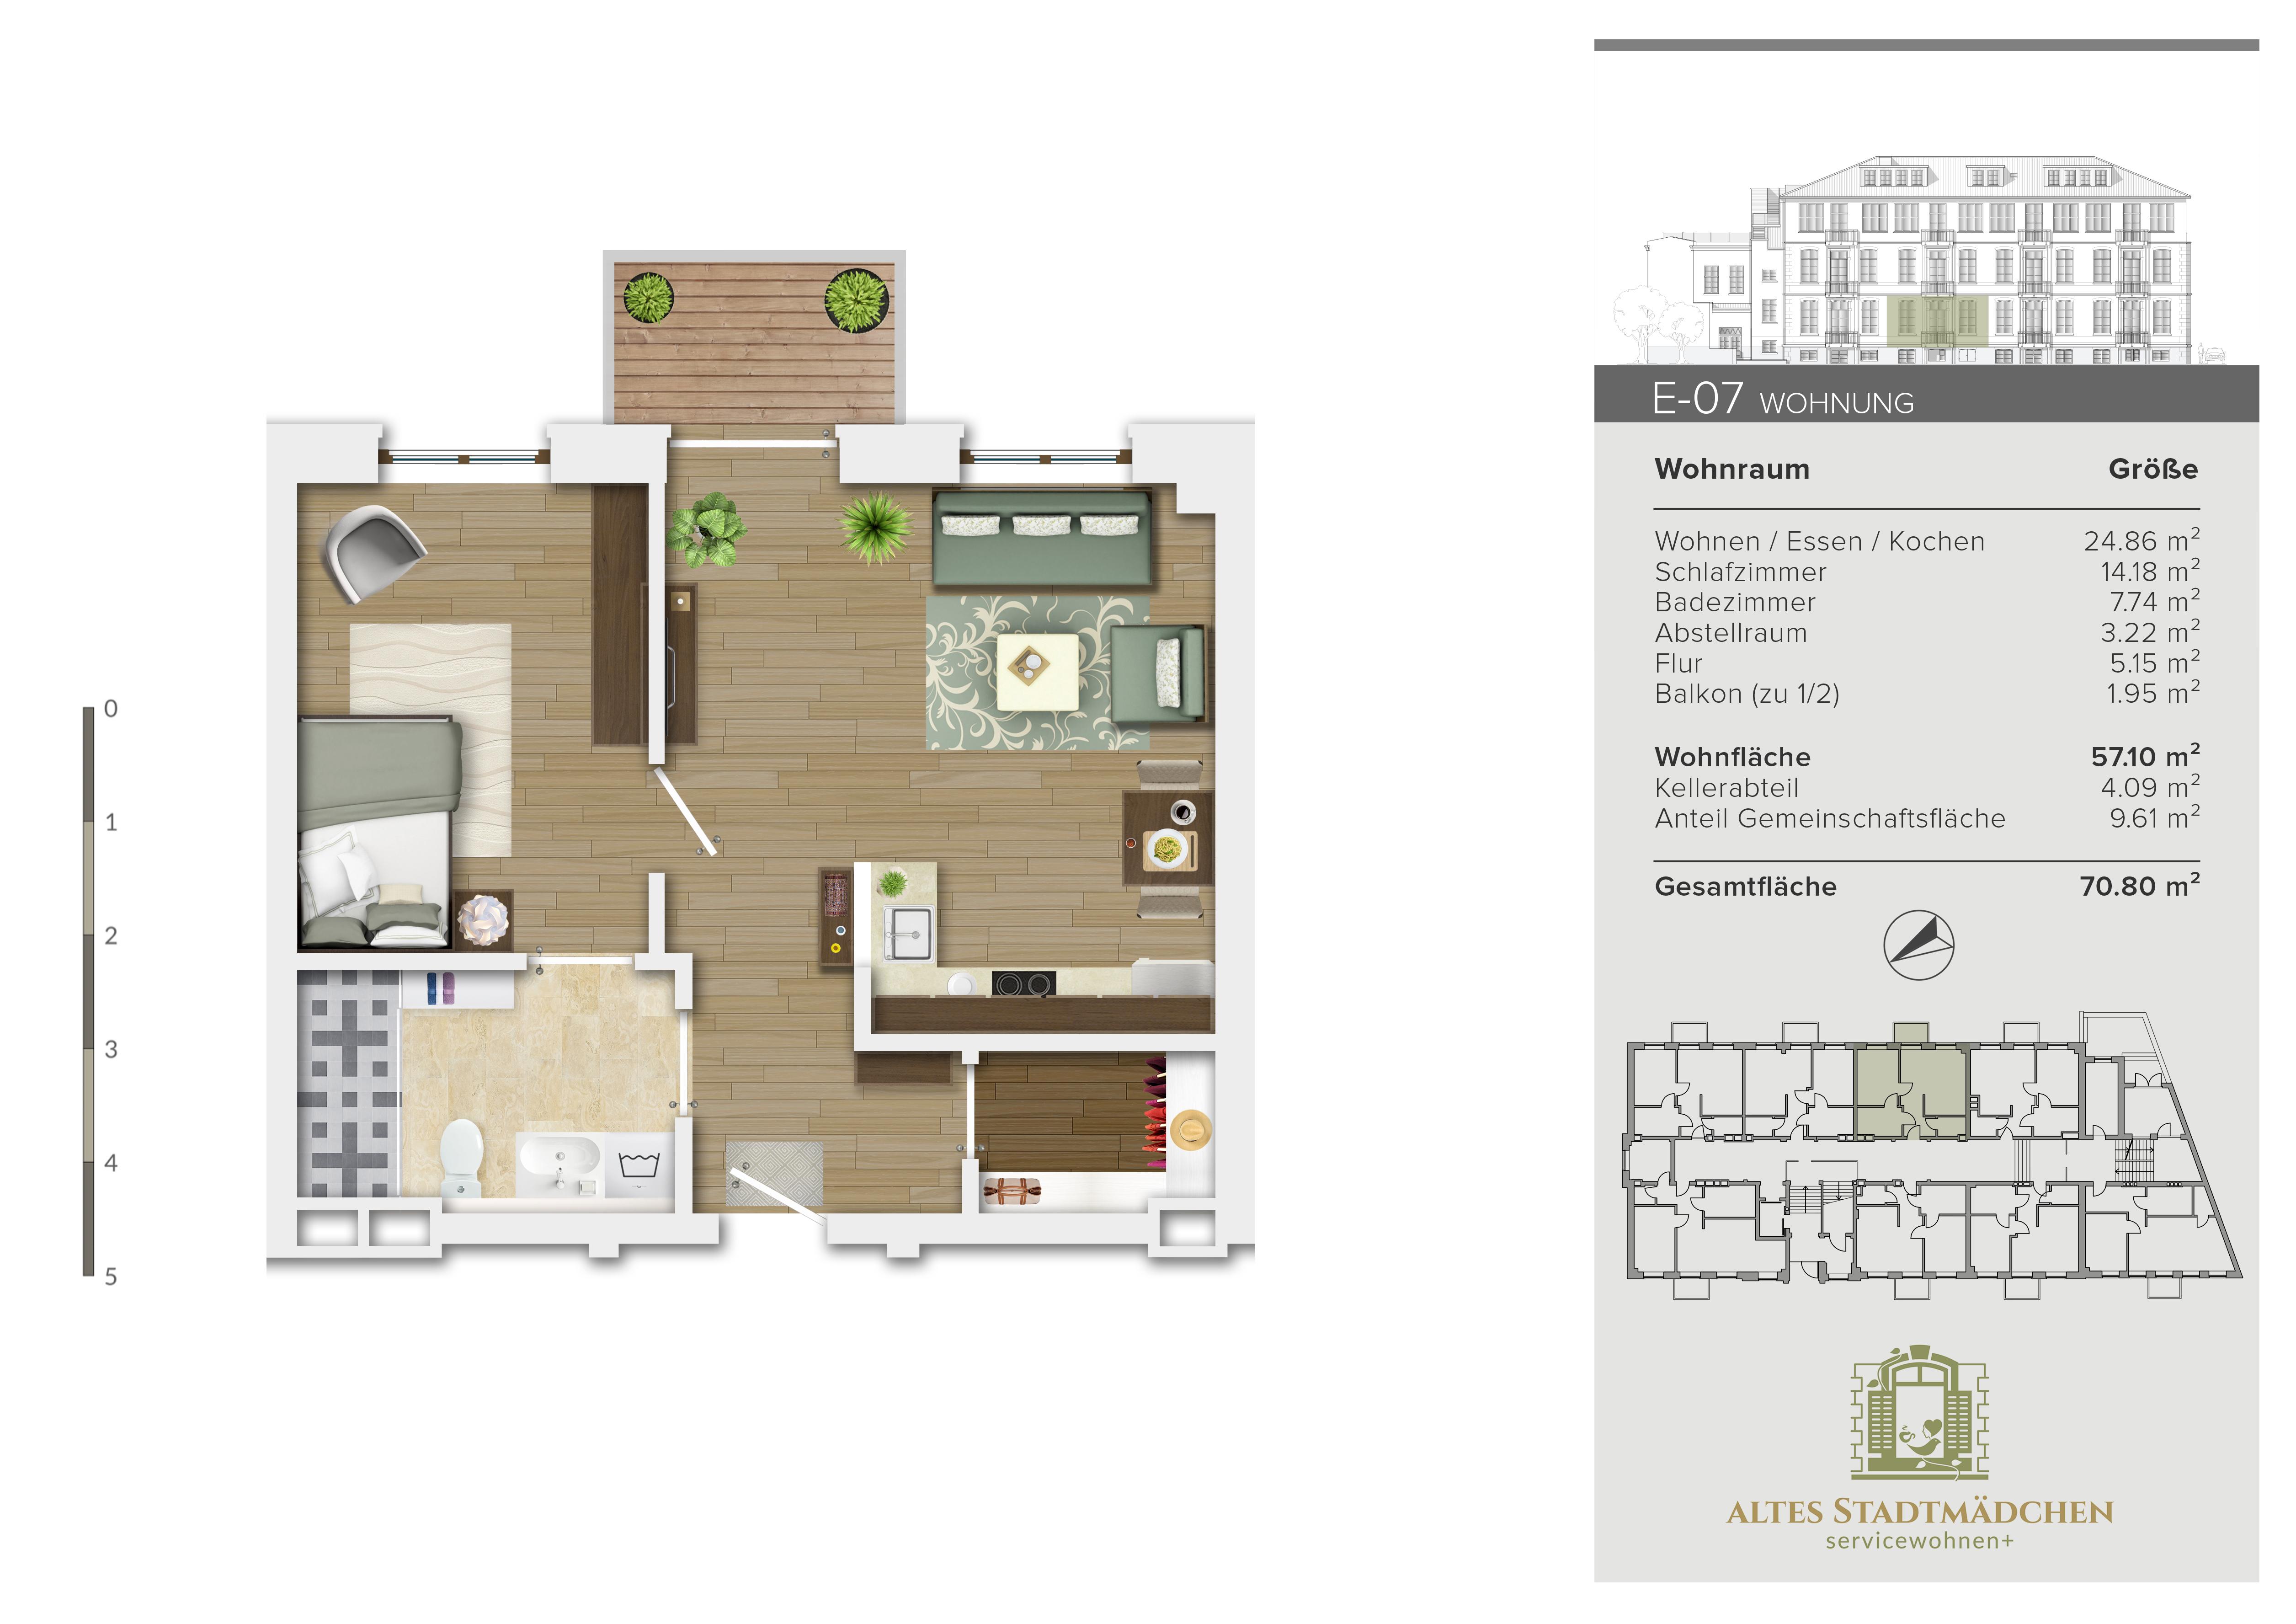 Wohnung E-07